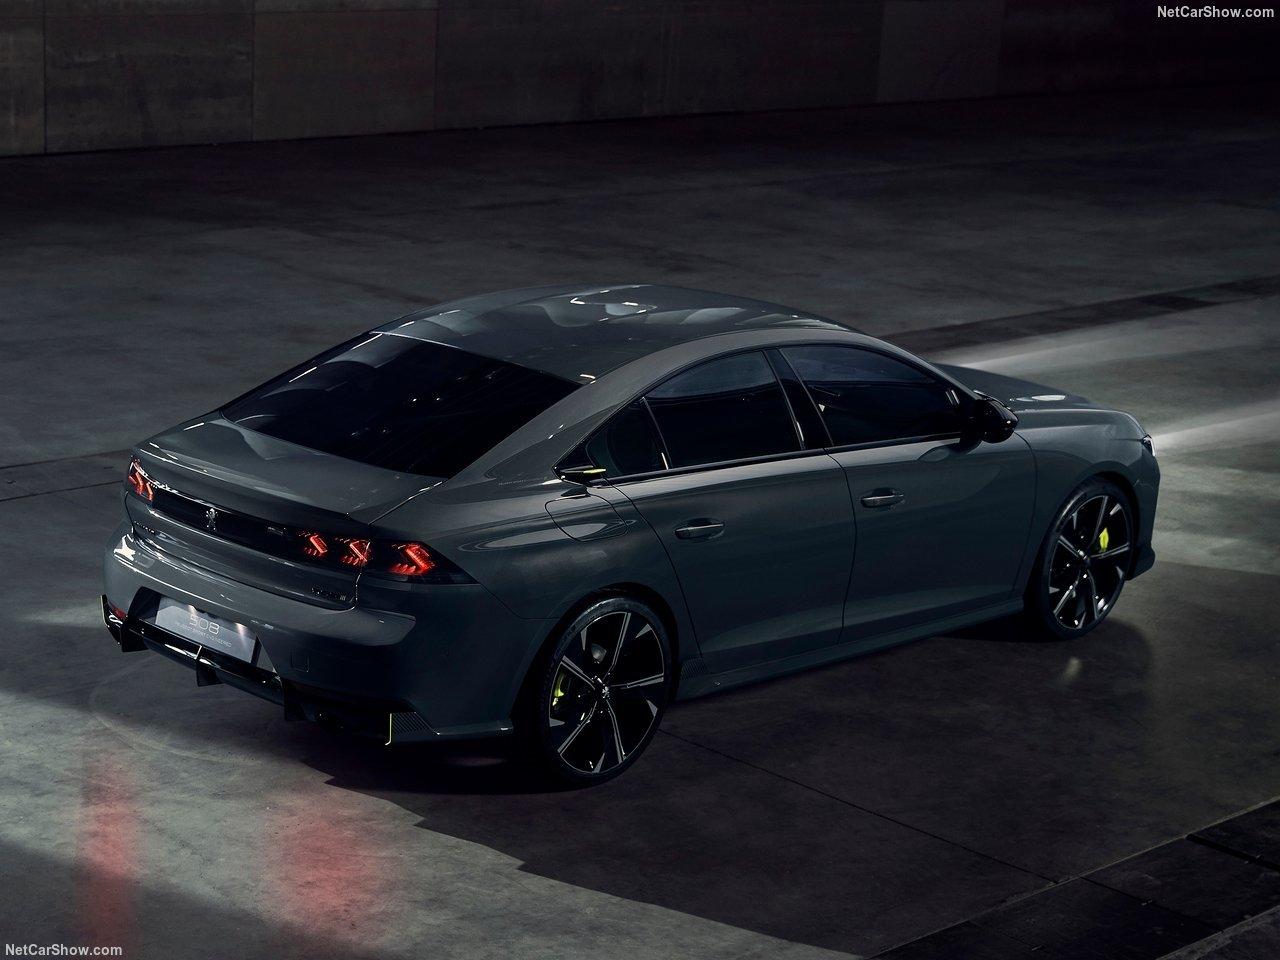 Peugeot Yeni Modelini Tanıttı Peugeot 508 Sport Engineeredın